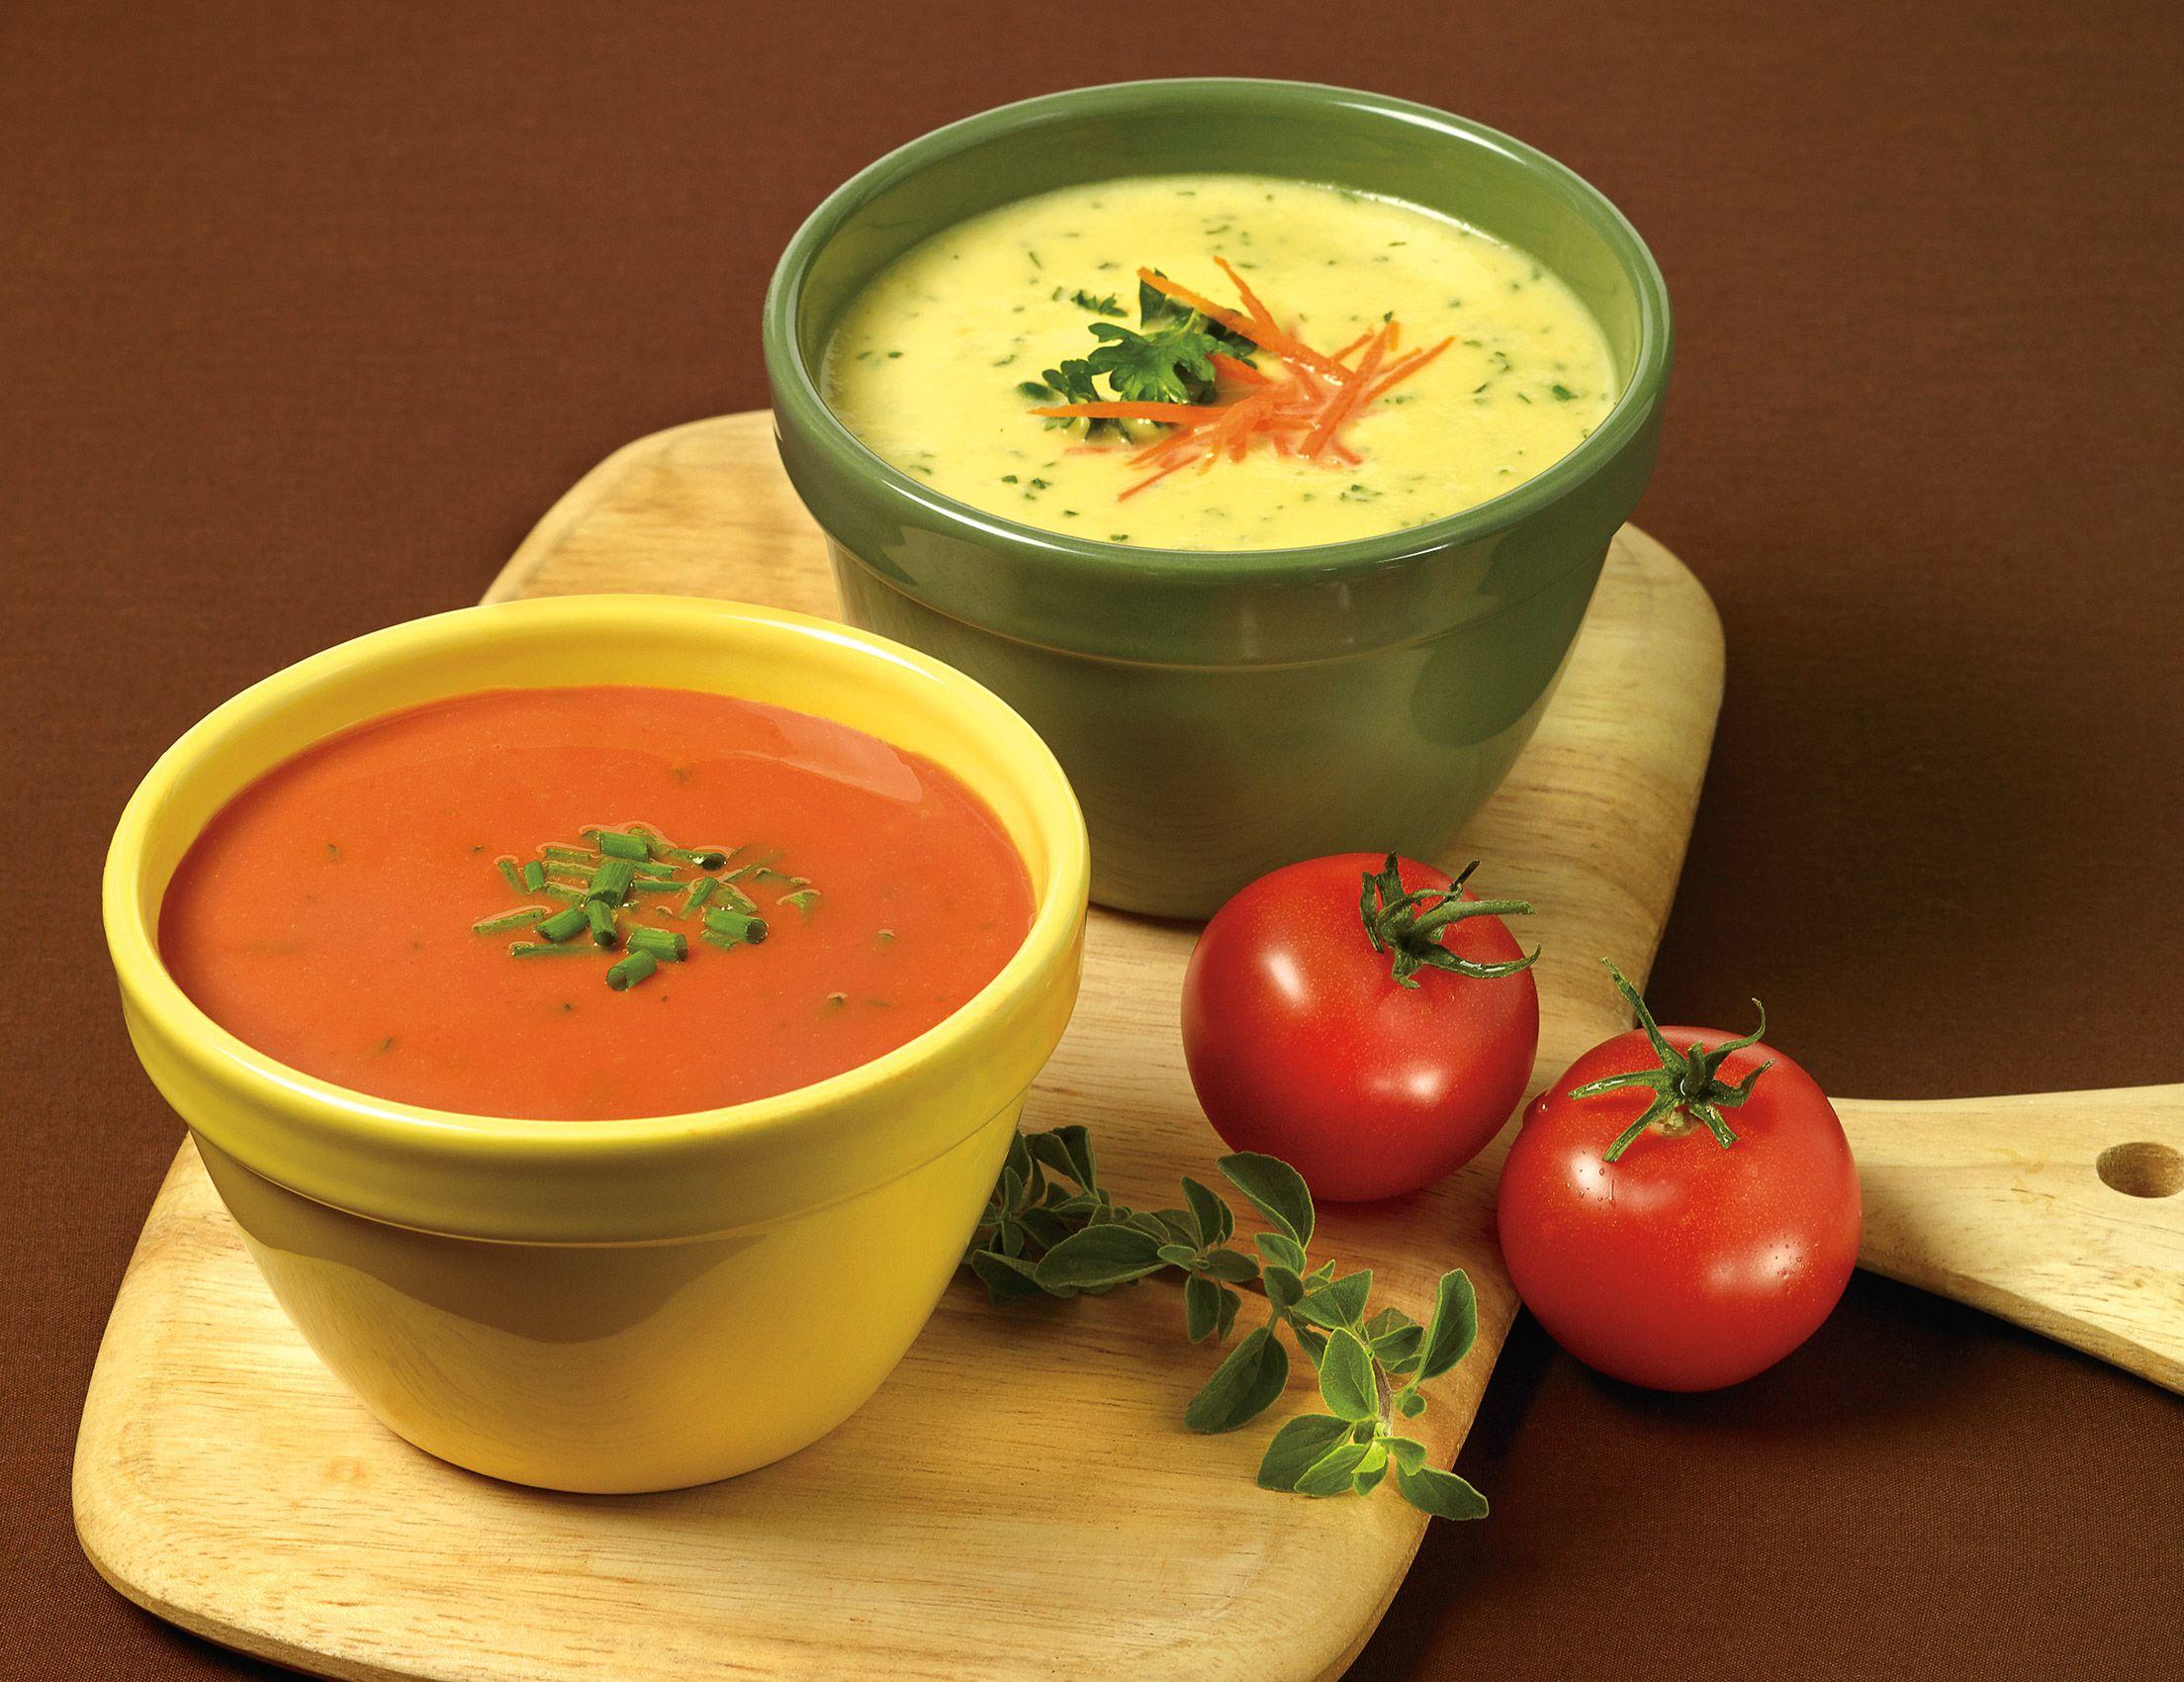 NM2_Tomato-Soup_Creamy-Chicken_Marketing.jpg